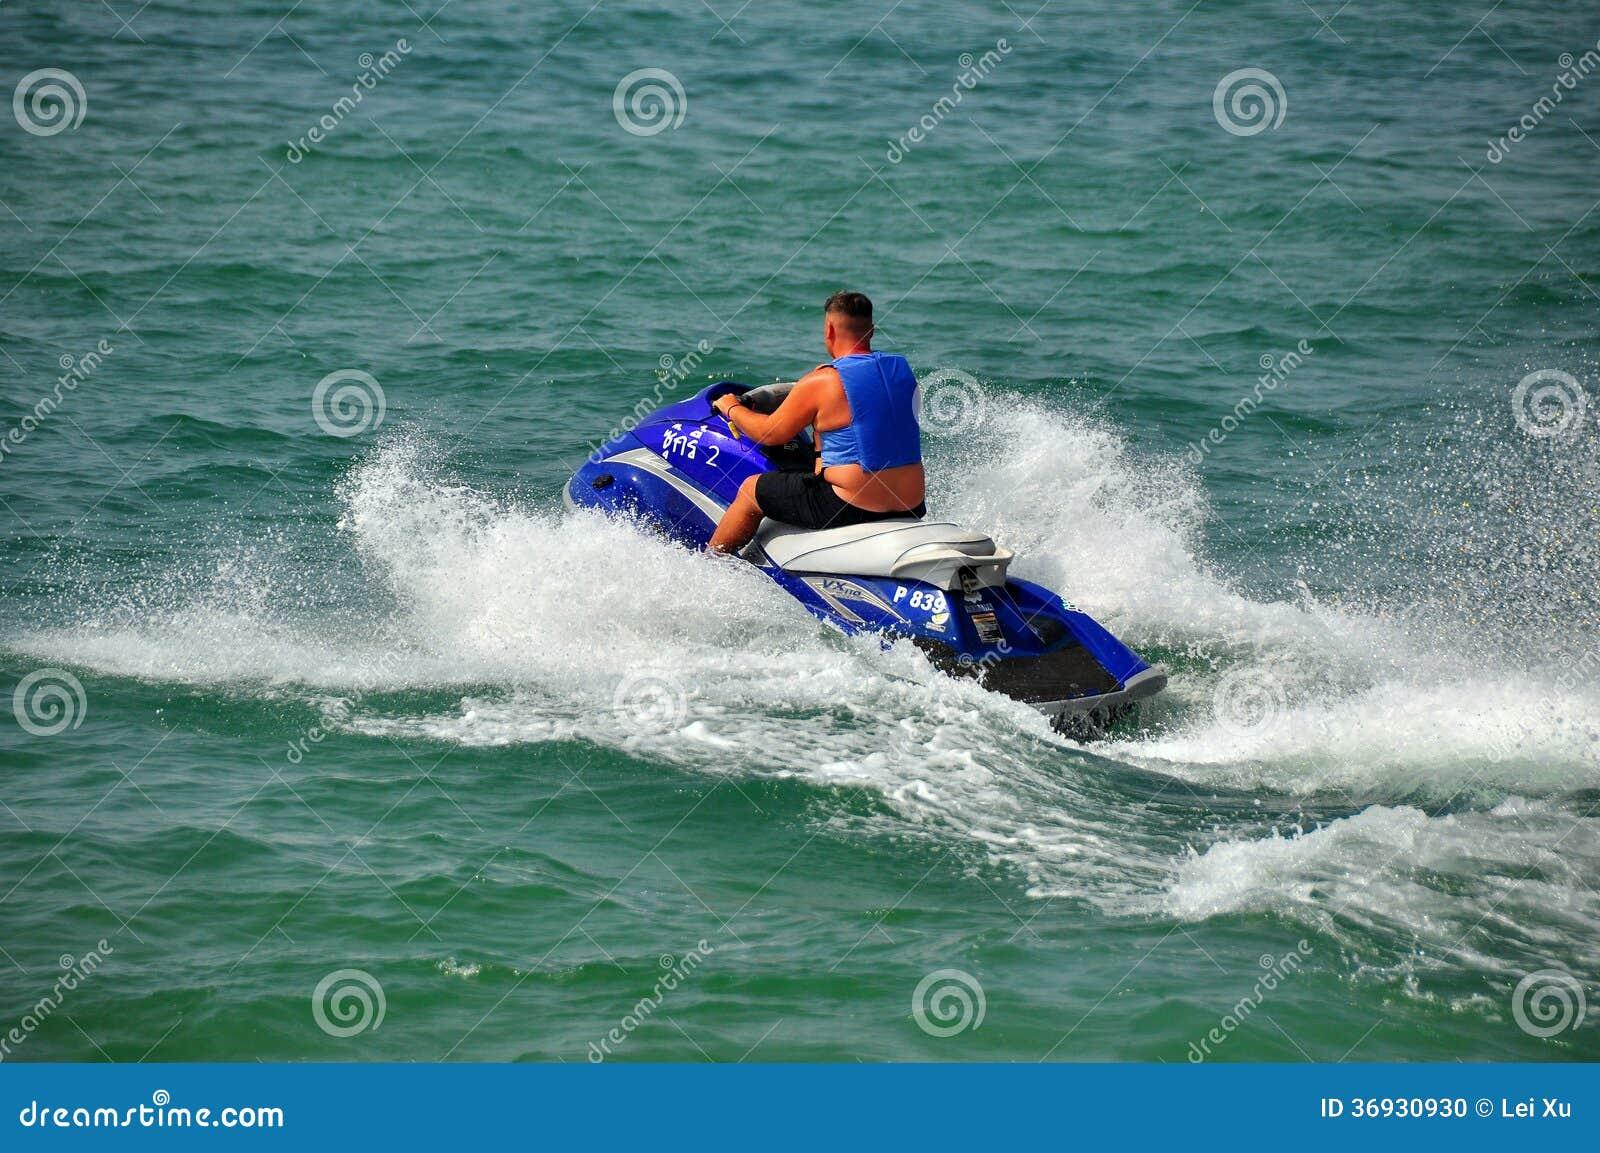 Pattaya, Thailand: Man On A Jet Ski Boat Editorial Image ...